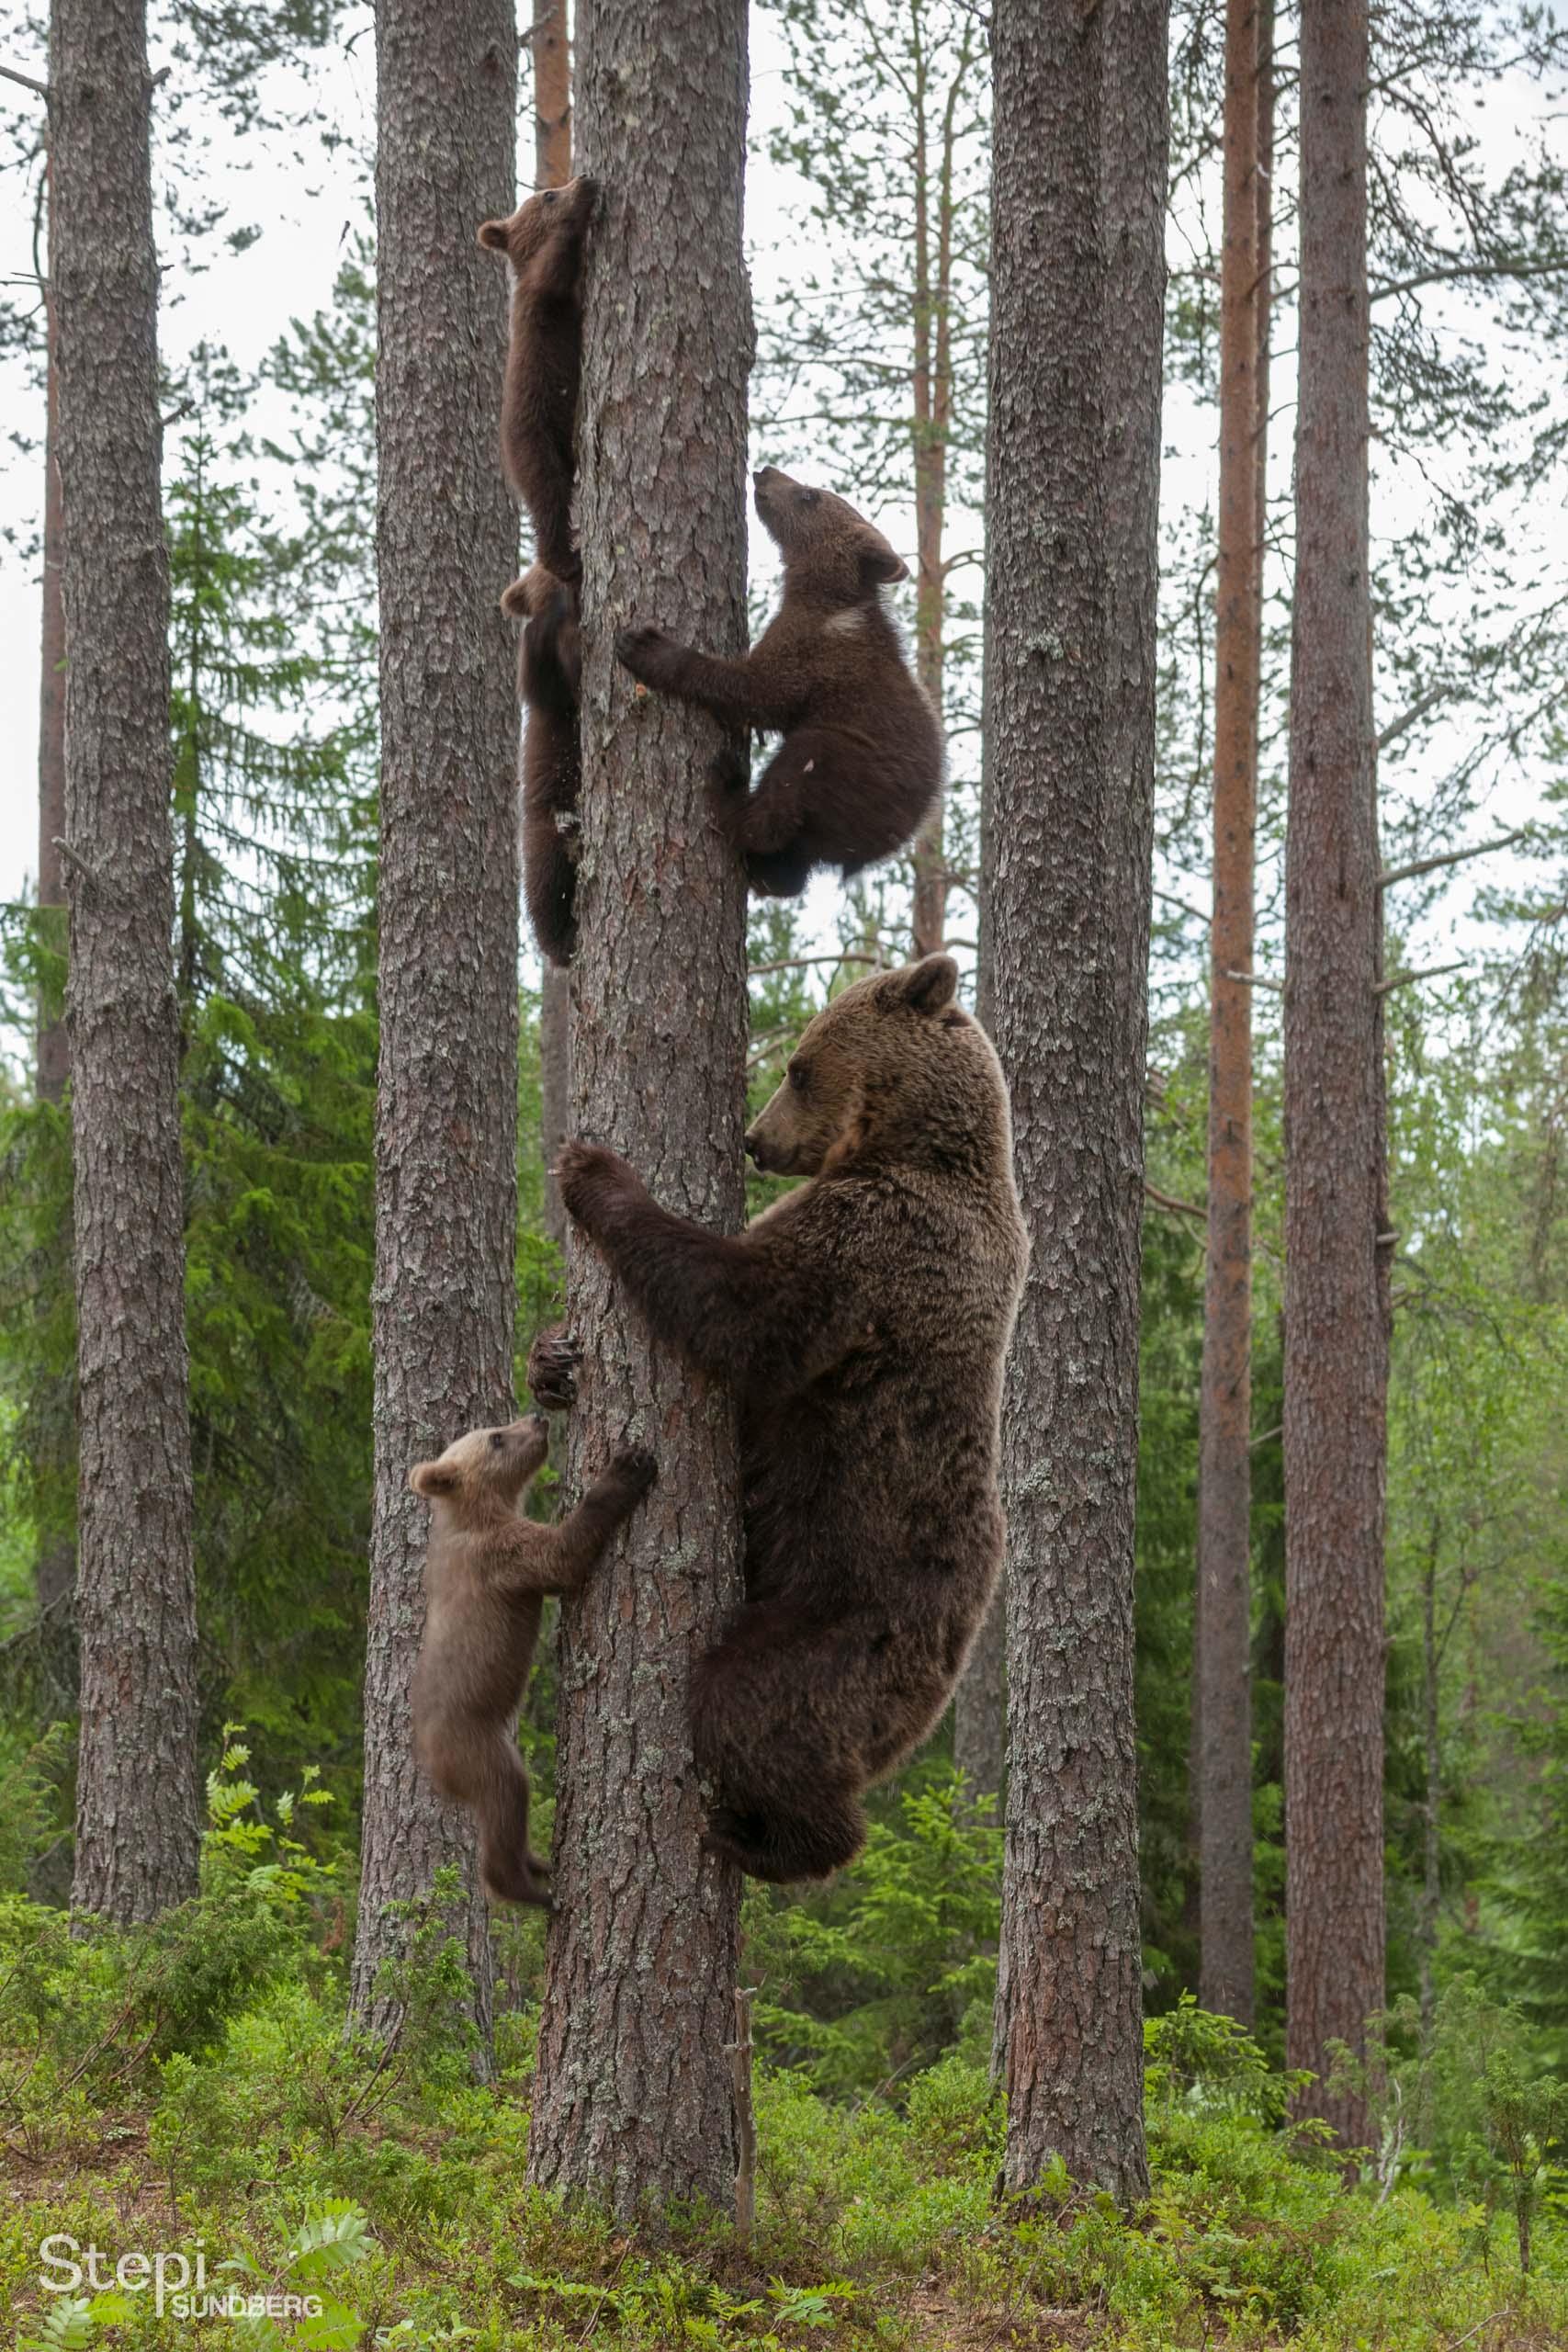 Valokuvaaja Stepi Sundberg luontokuva nelospennut